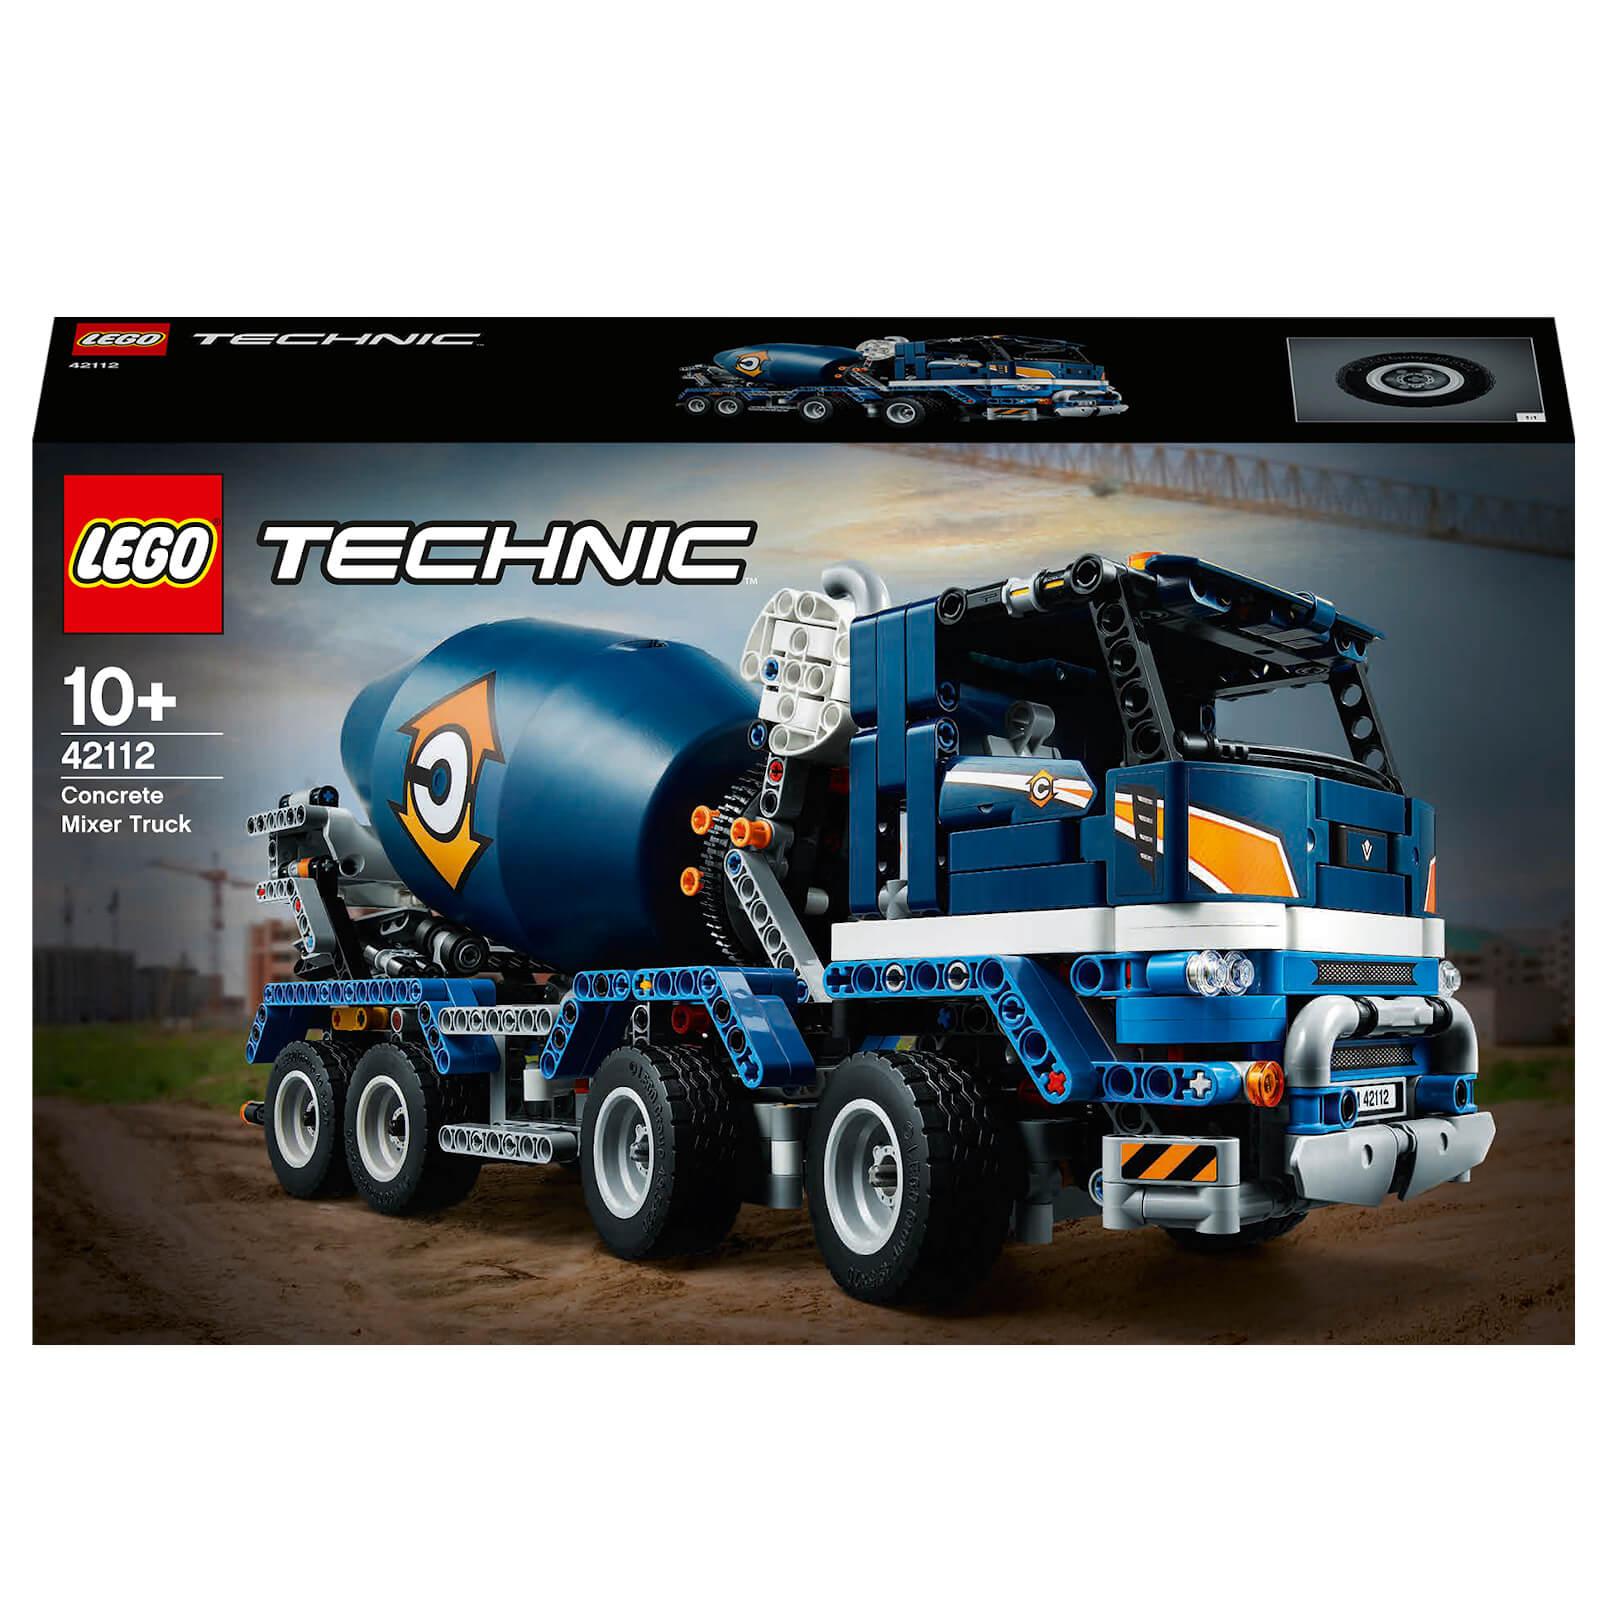 Image of LEGO Technic Concrete Mixer Truck - 42112